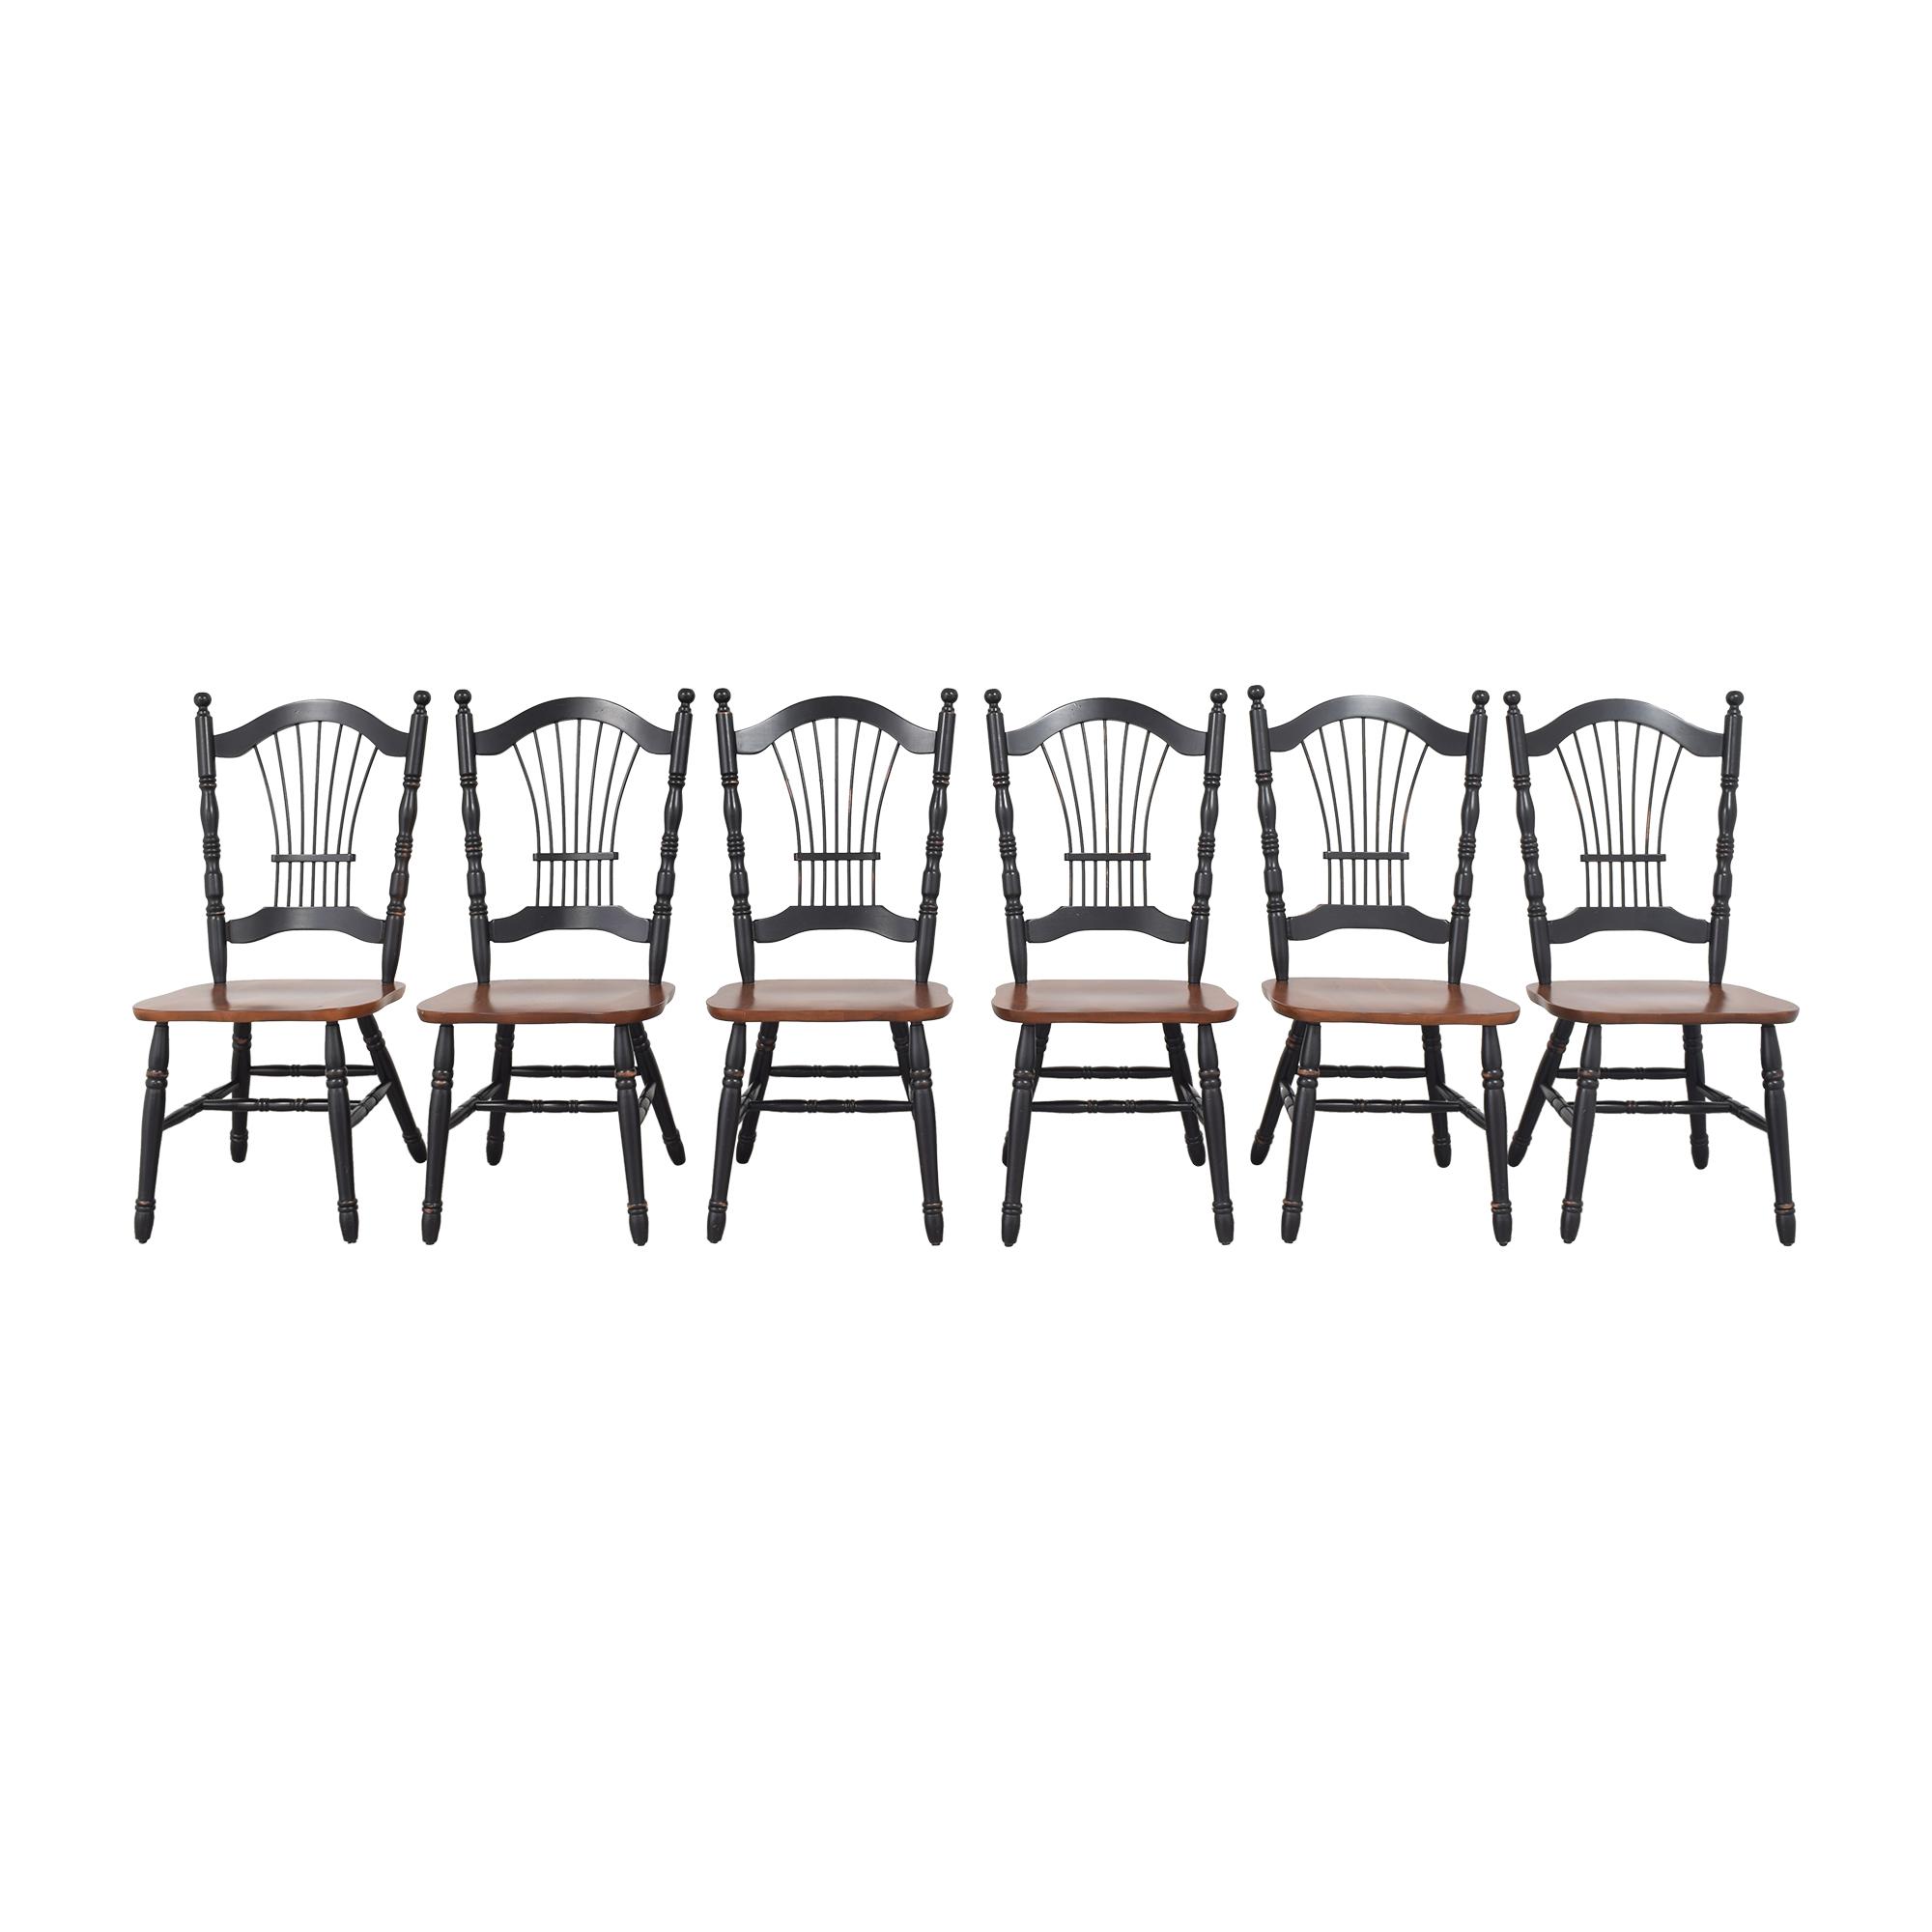 Bermex Bermex Wheat Back Dining Side Chairs dimensions